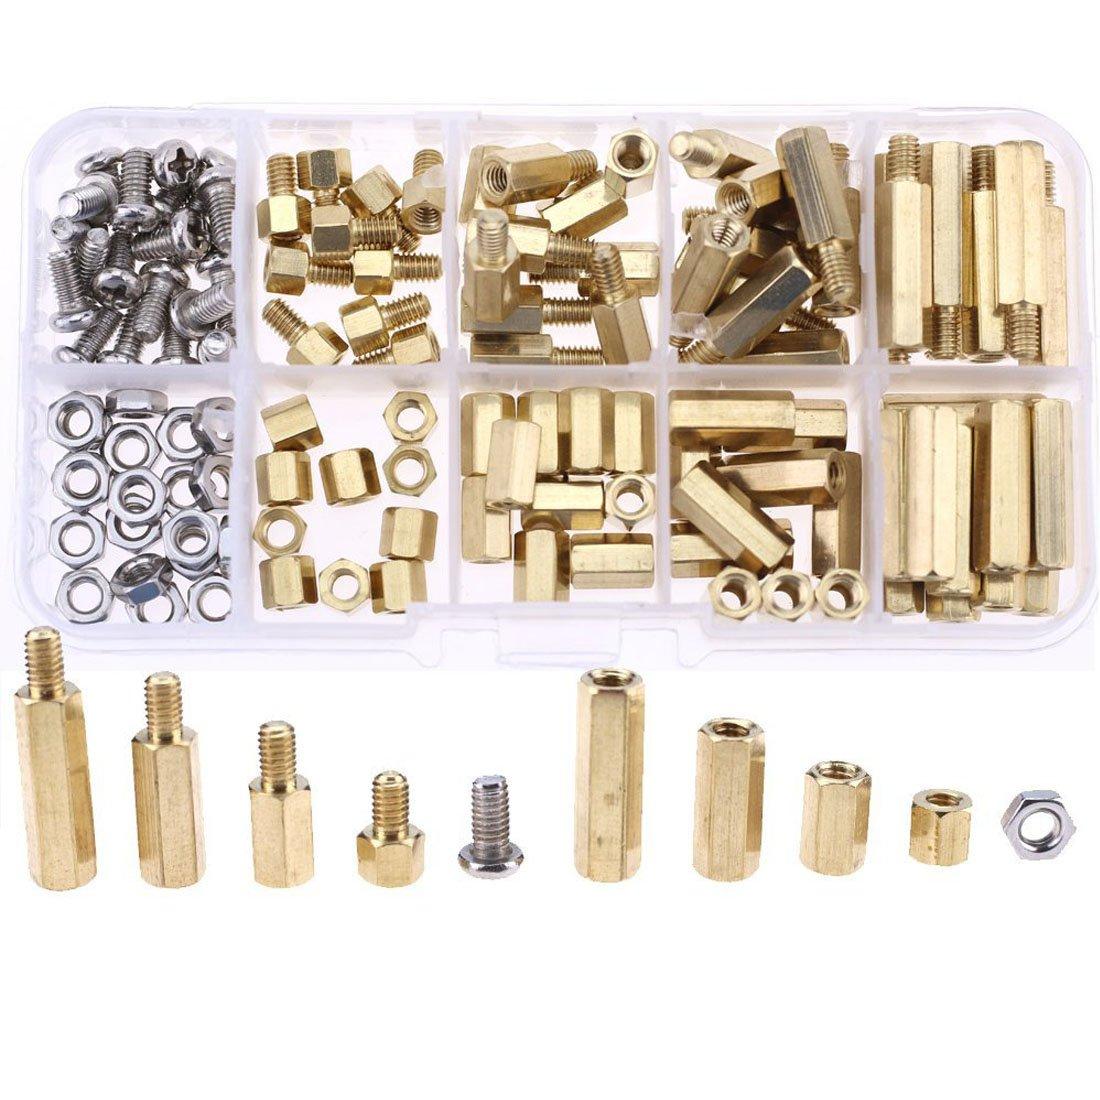 Jekewin 8 Sizes 120pcs Universal M3 Brass Standoffs Nut Screws Assortment Kit